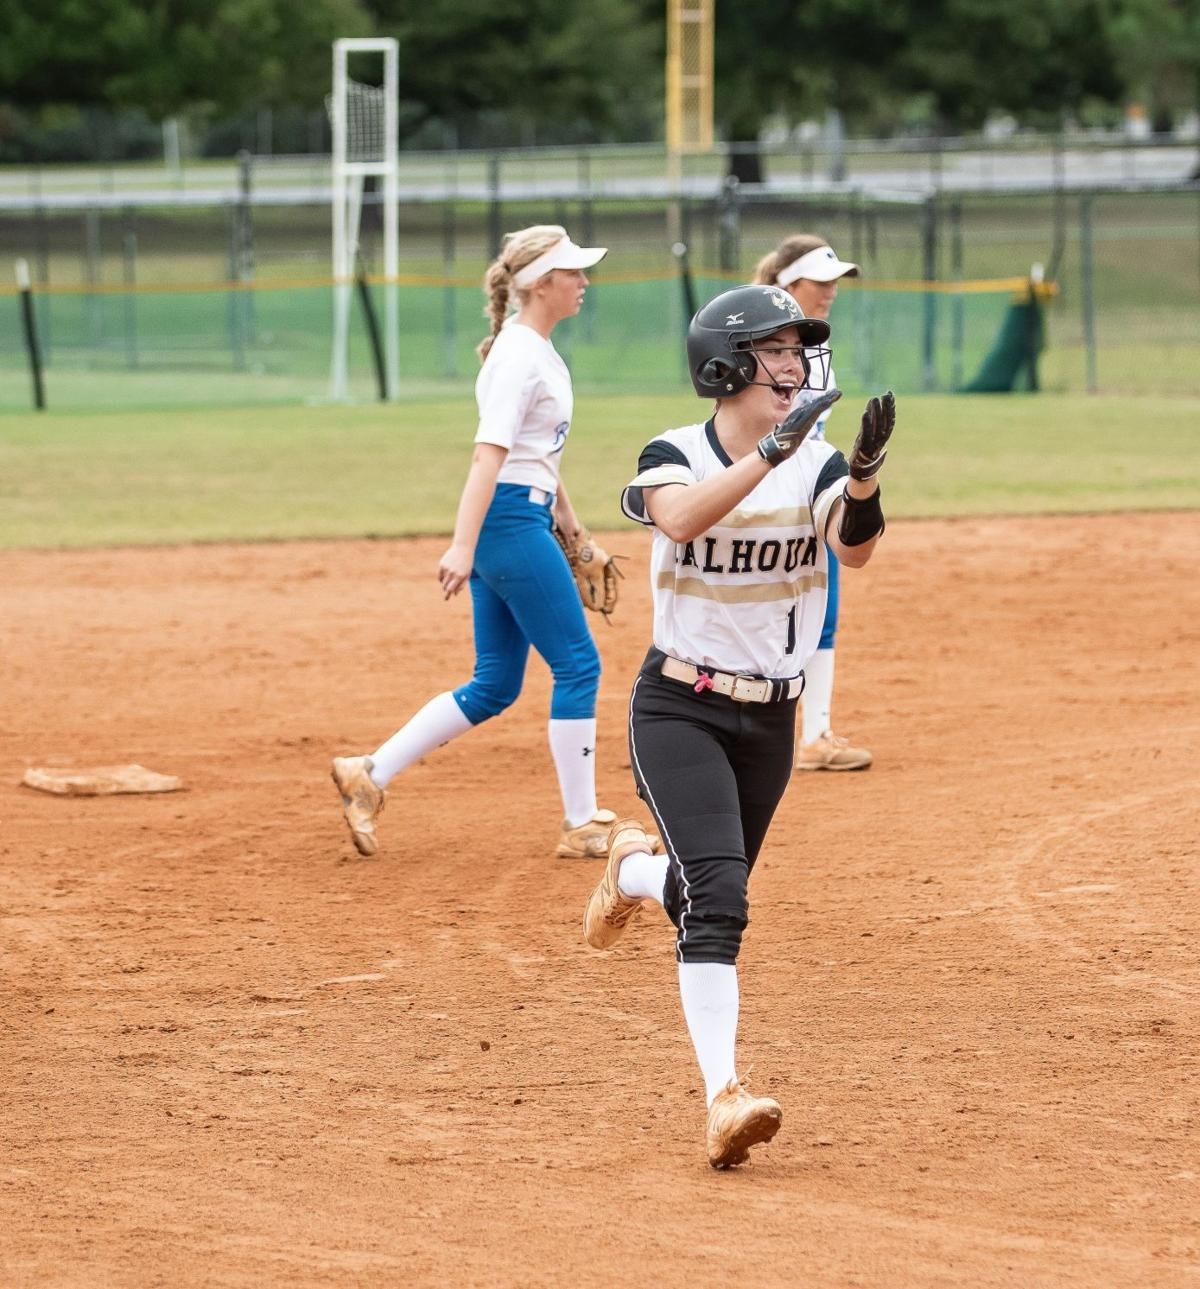 Calhoun Softball - 2019 State Tournament